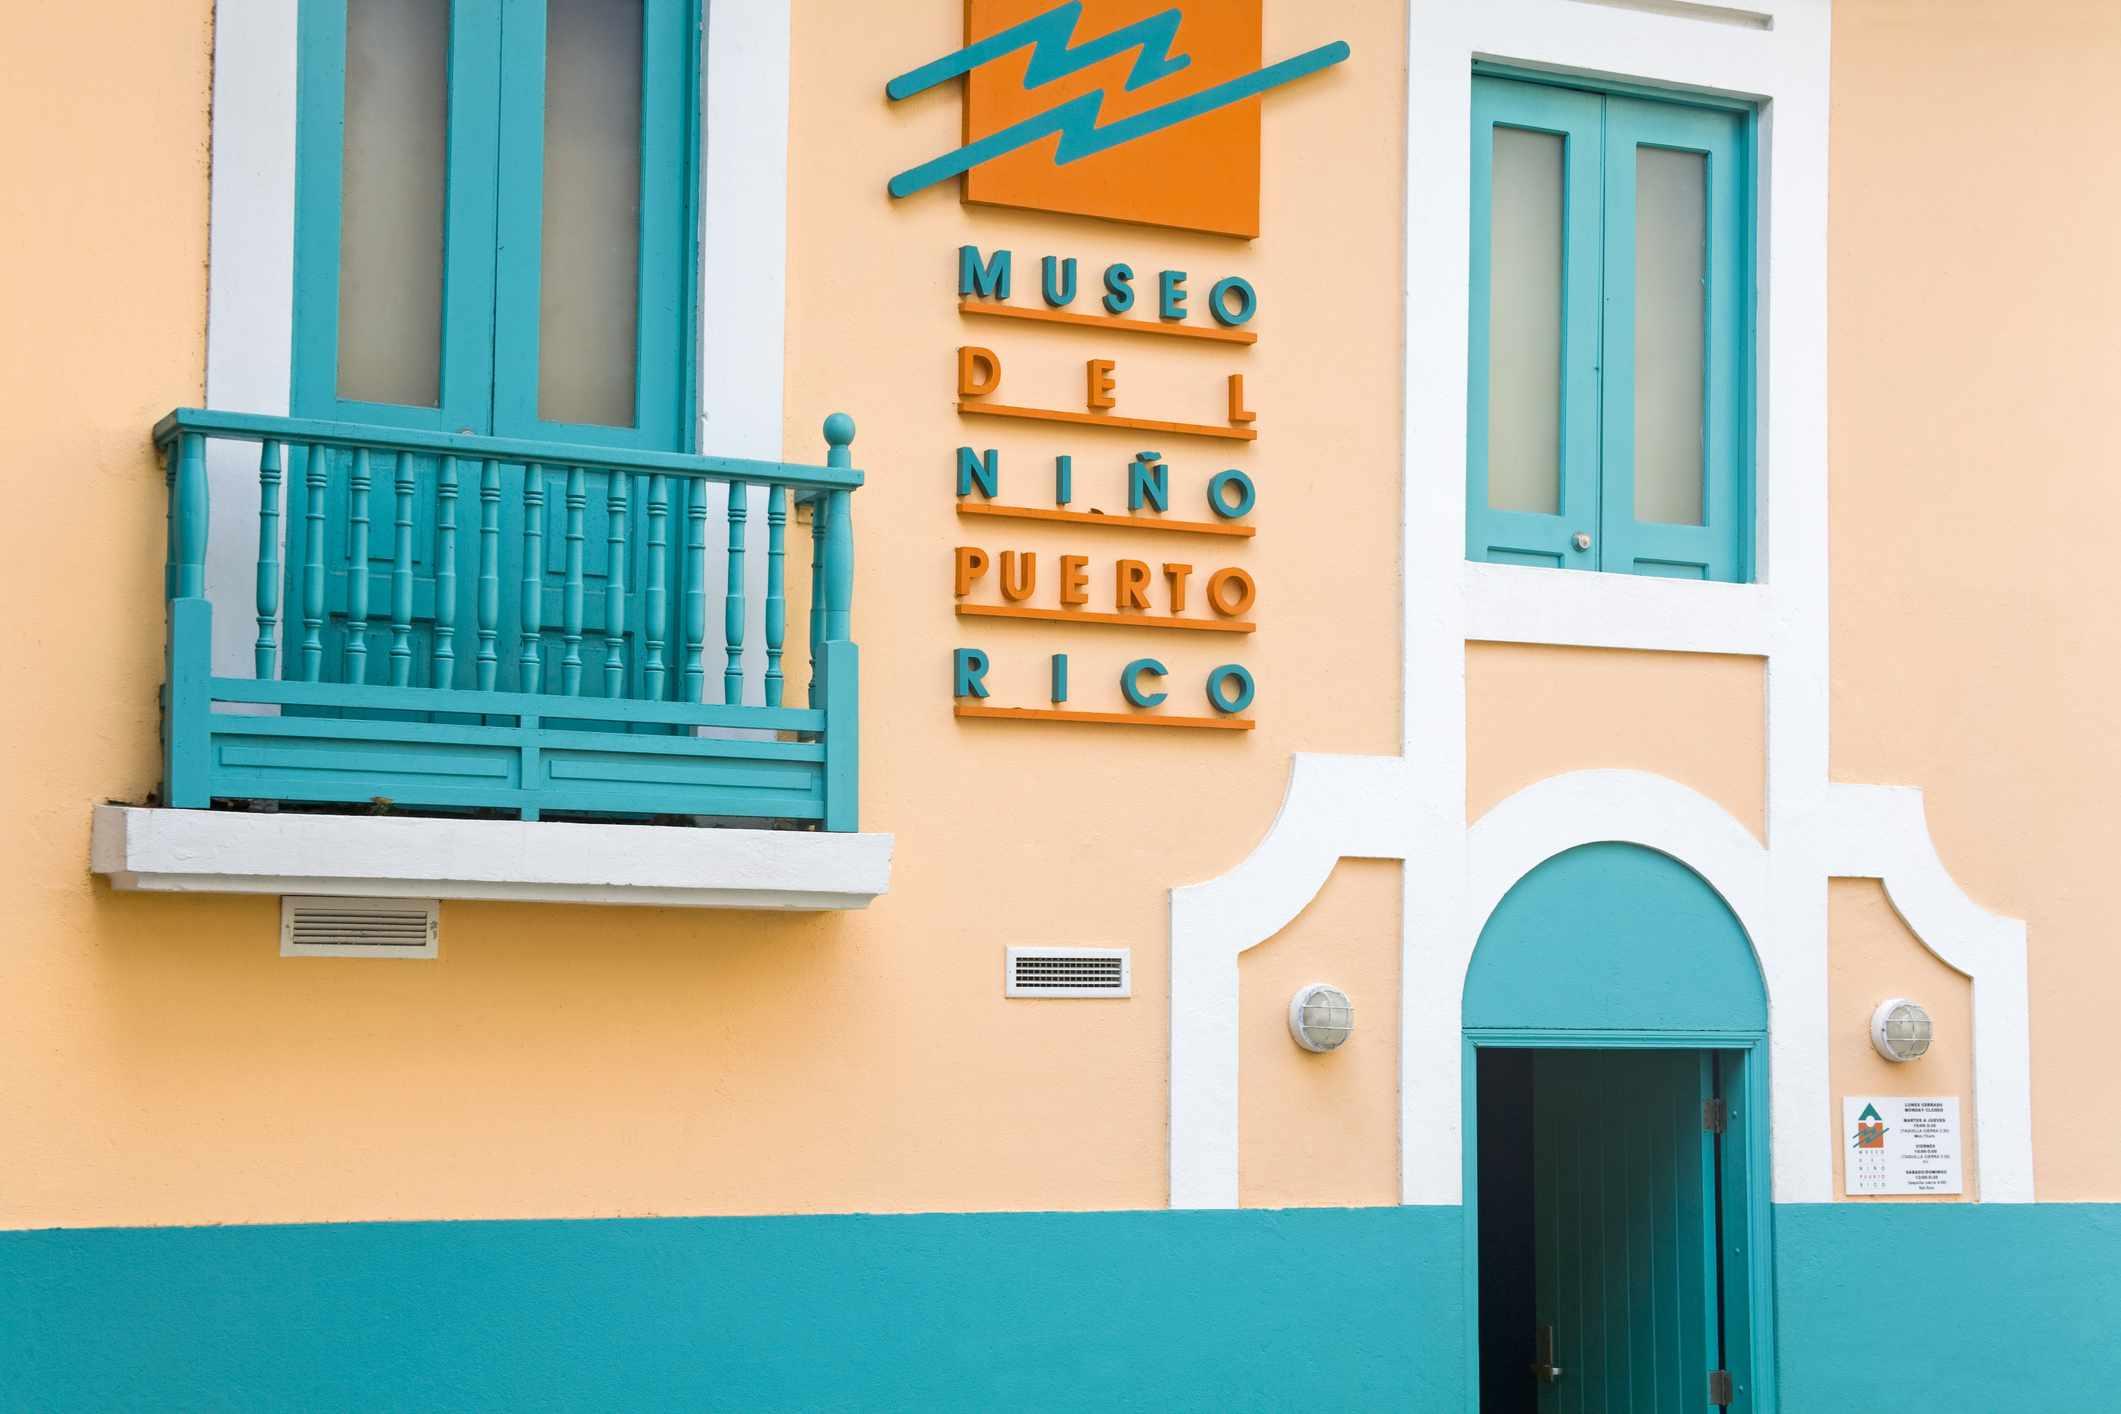 Blue and pastel orange exterior of the Children's Museum in Old San Juan